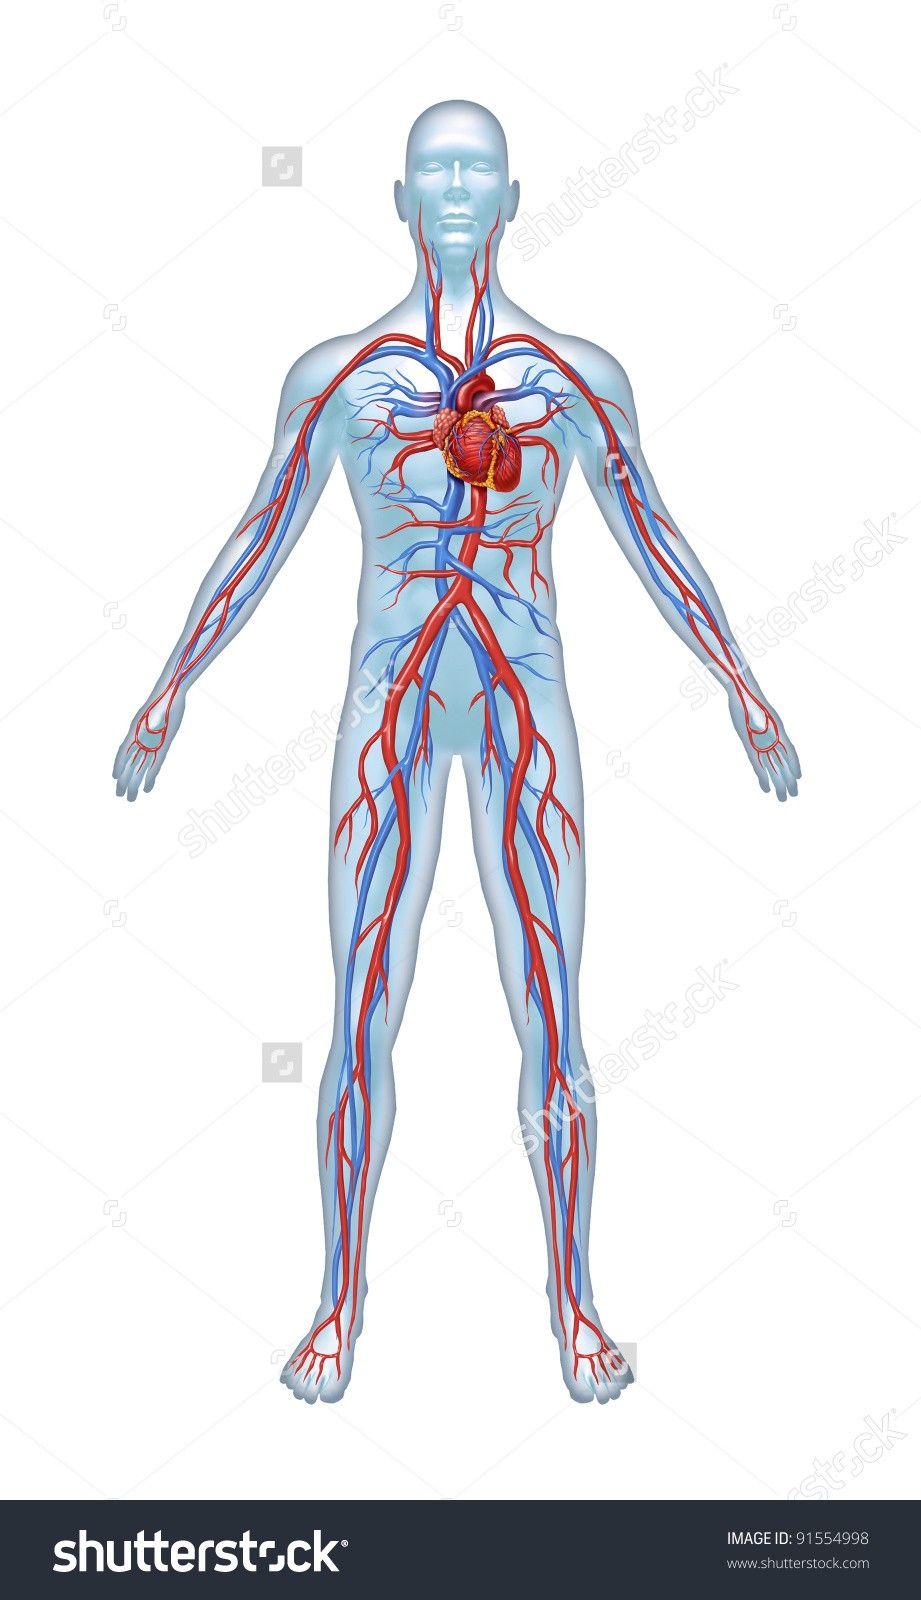 Human Body Unlabeled Diagram - Human AnatomyHuman Anatomy